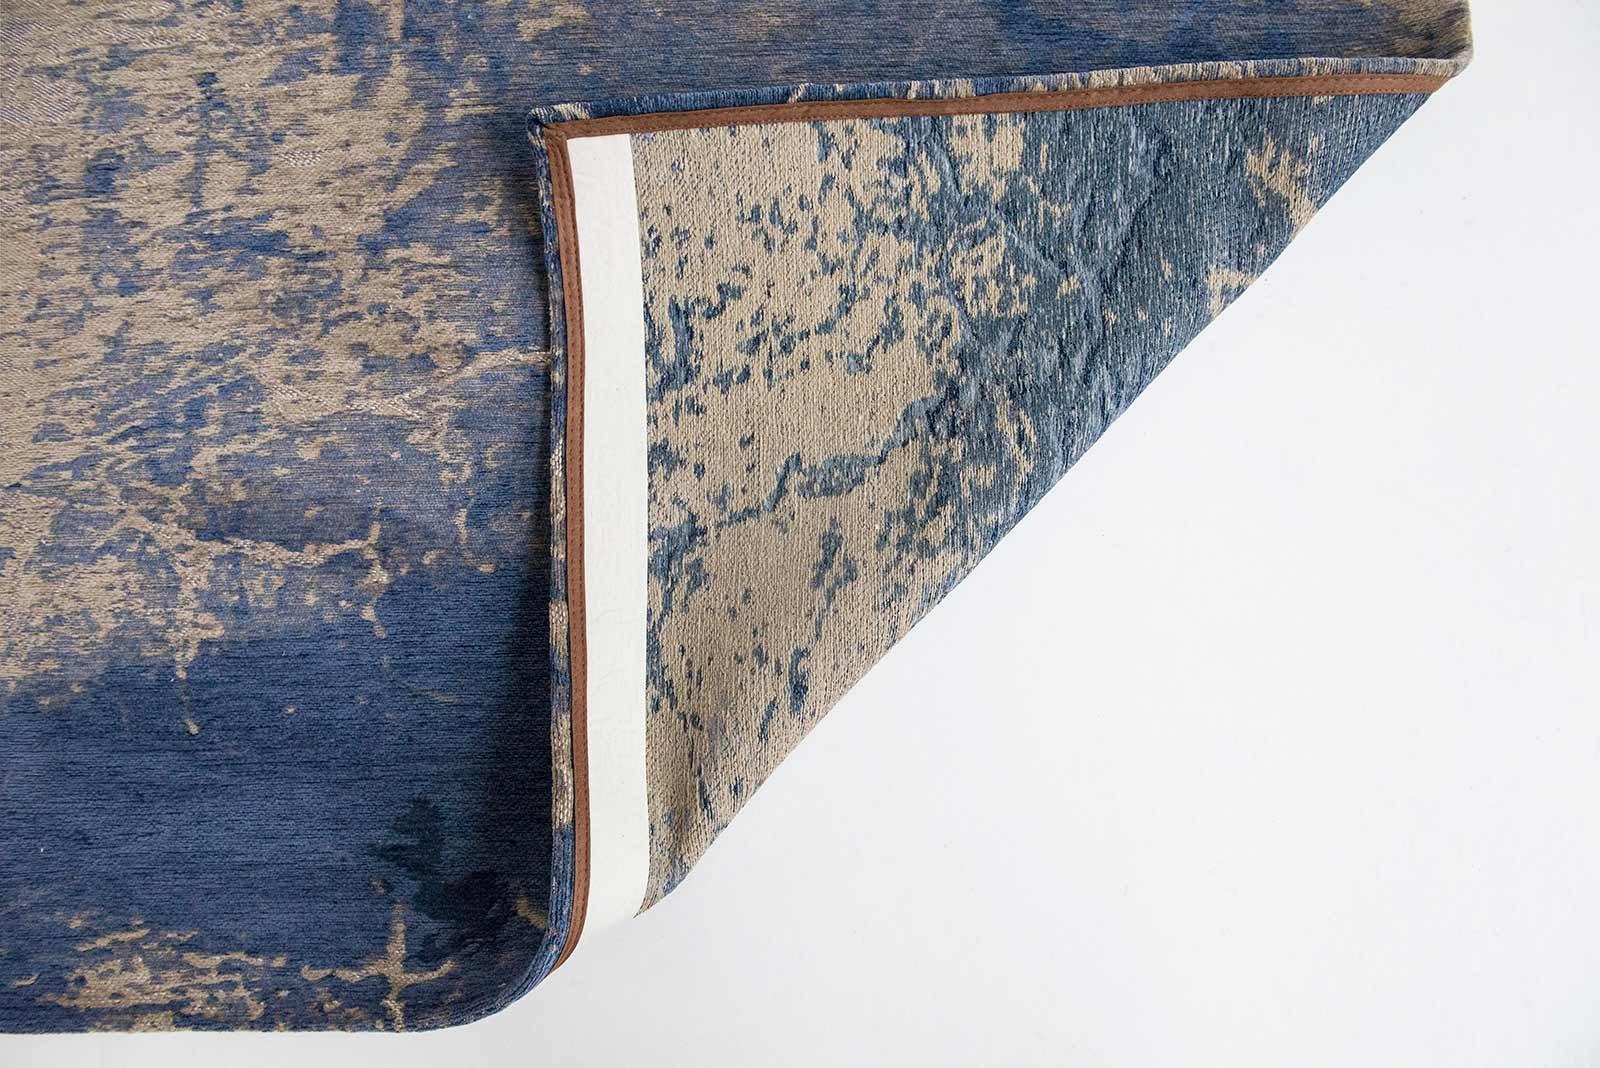 rugs Louis De Poortere LX8629 Mad Men Cracks Abyss Blue back